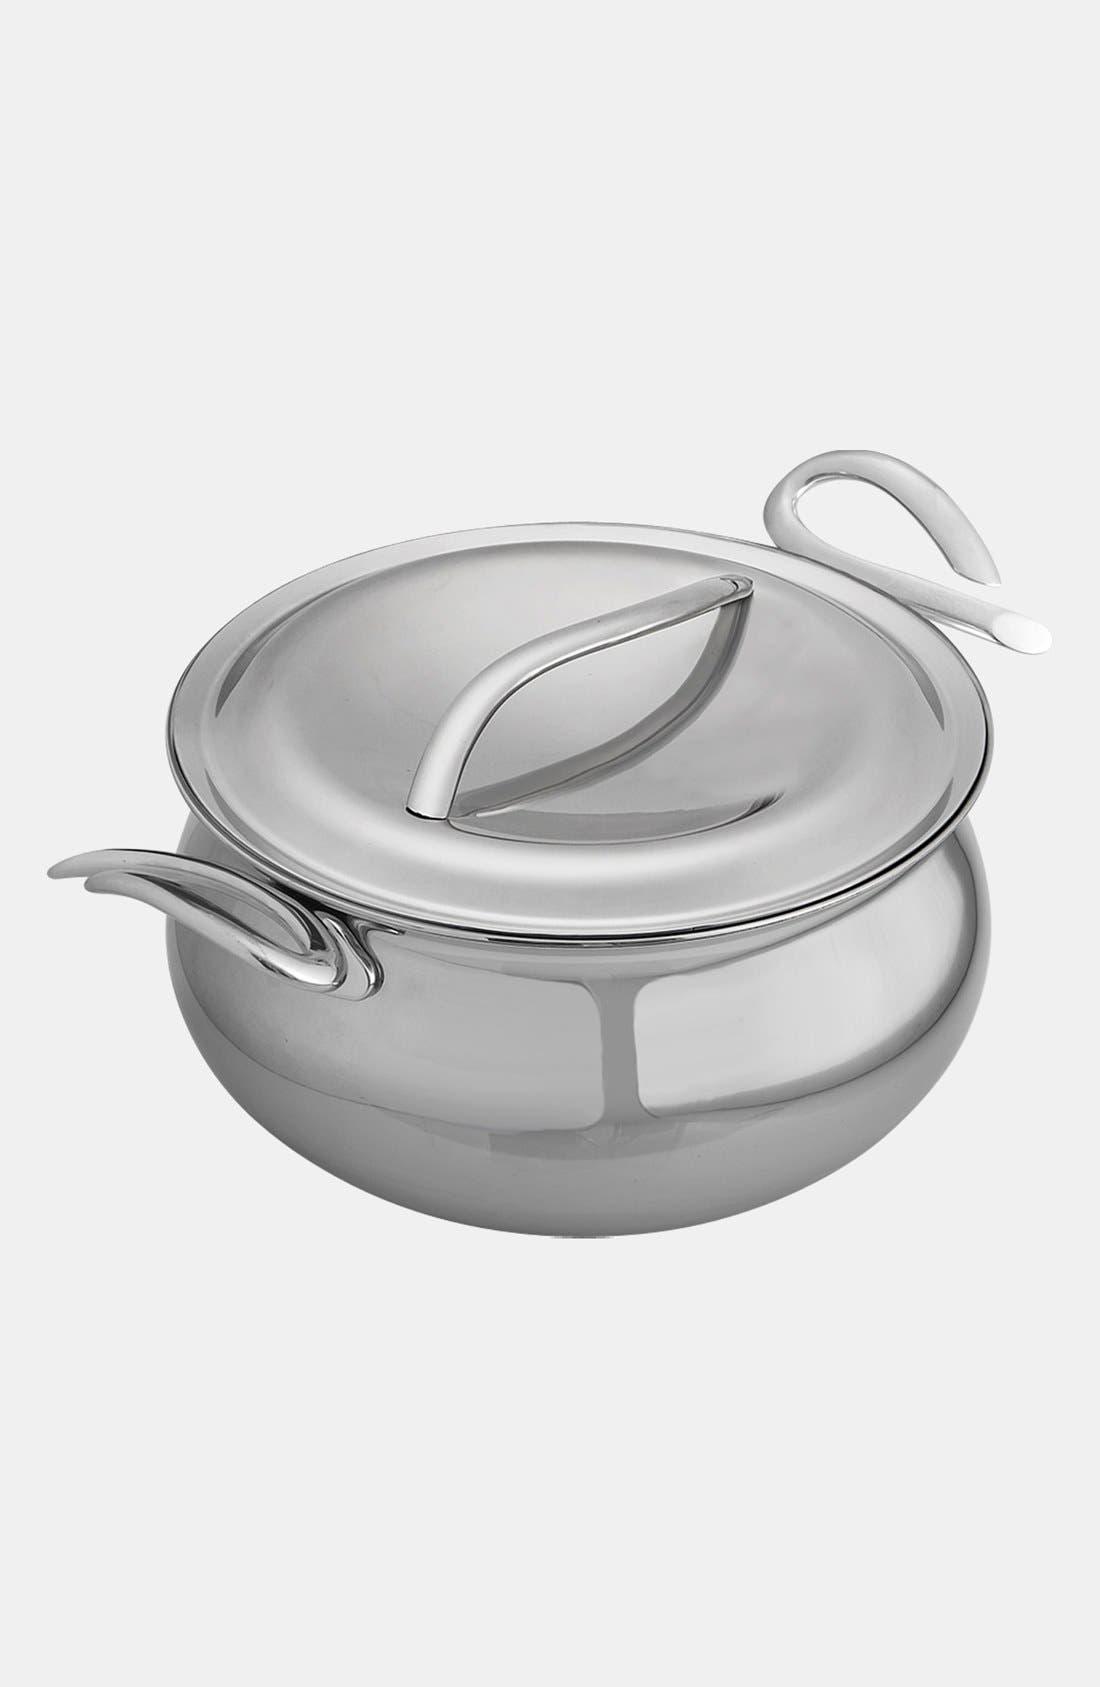 Main Image - Nambé CookServ 8-Quart Stock Pot